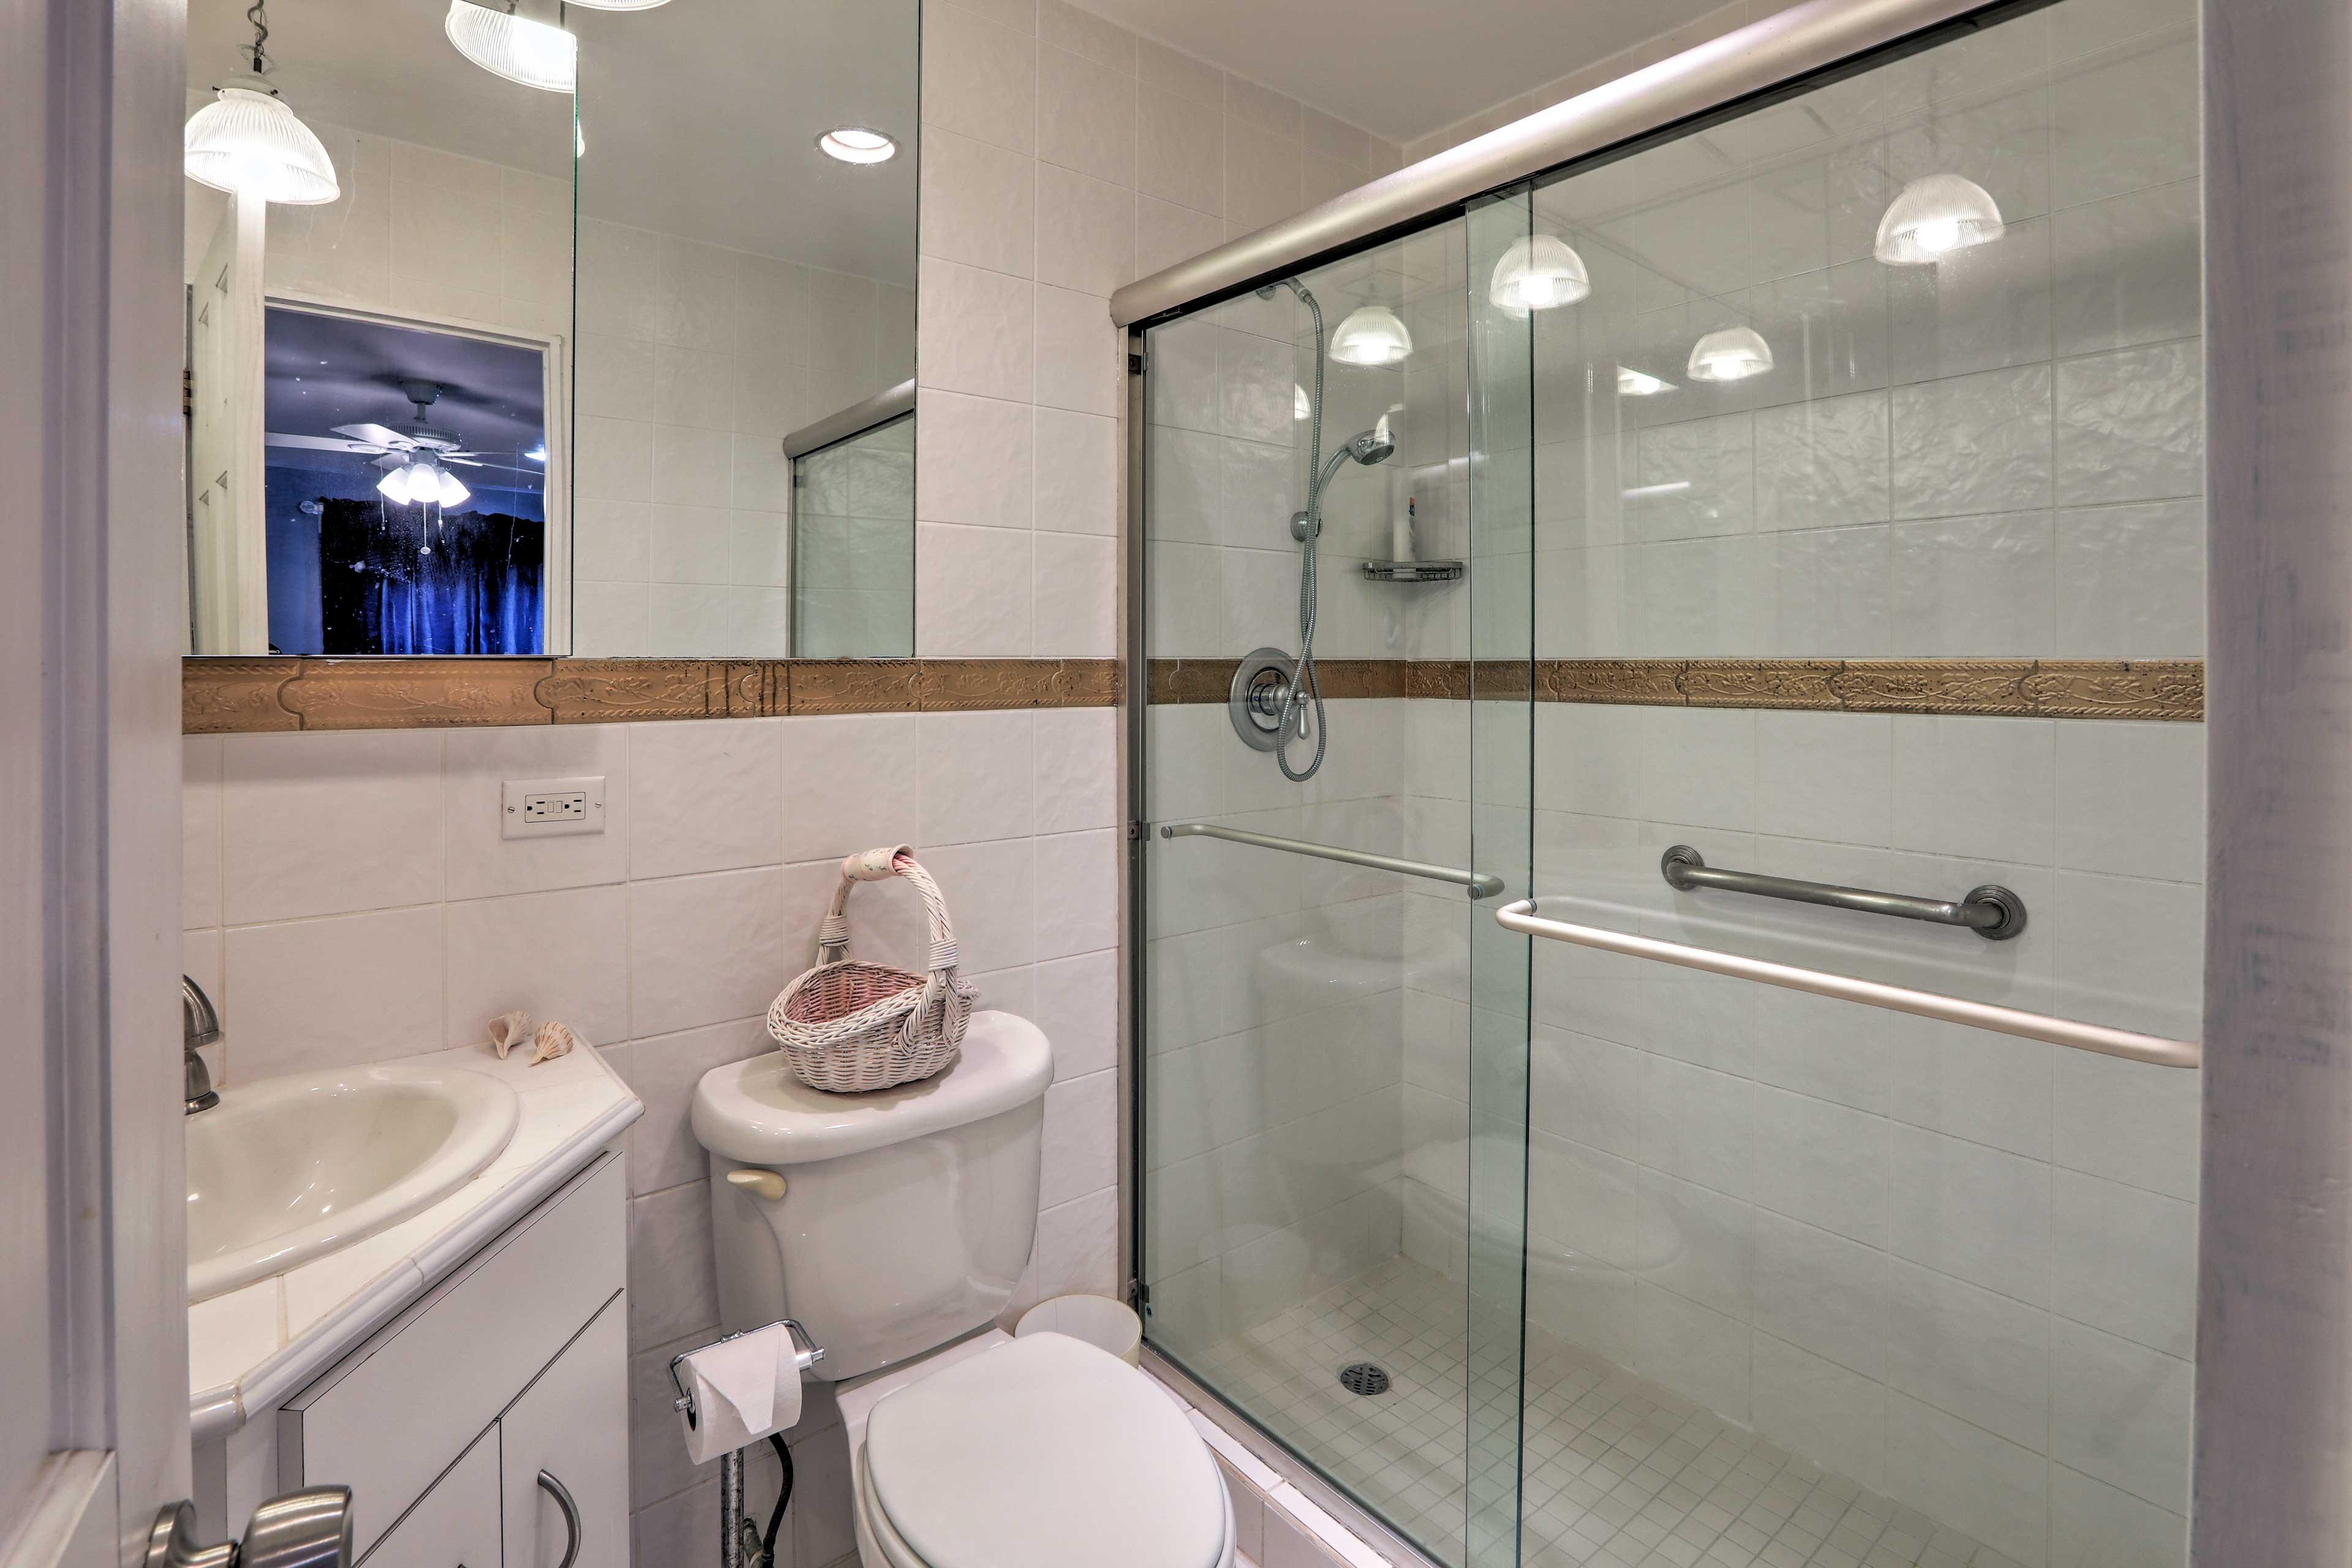 Rinse off in the walk-in shower in the en-suite bathroom.